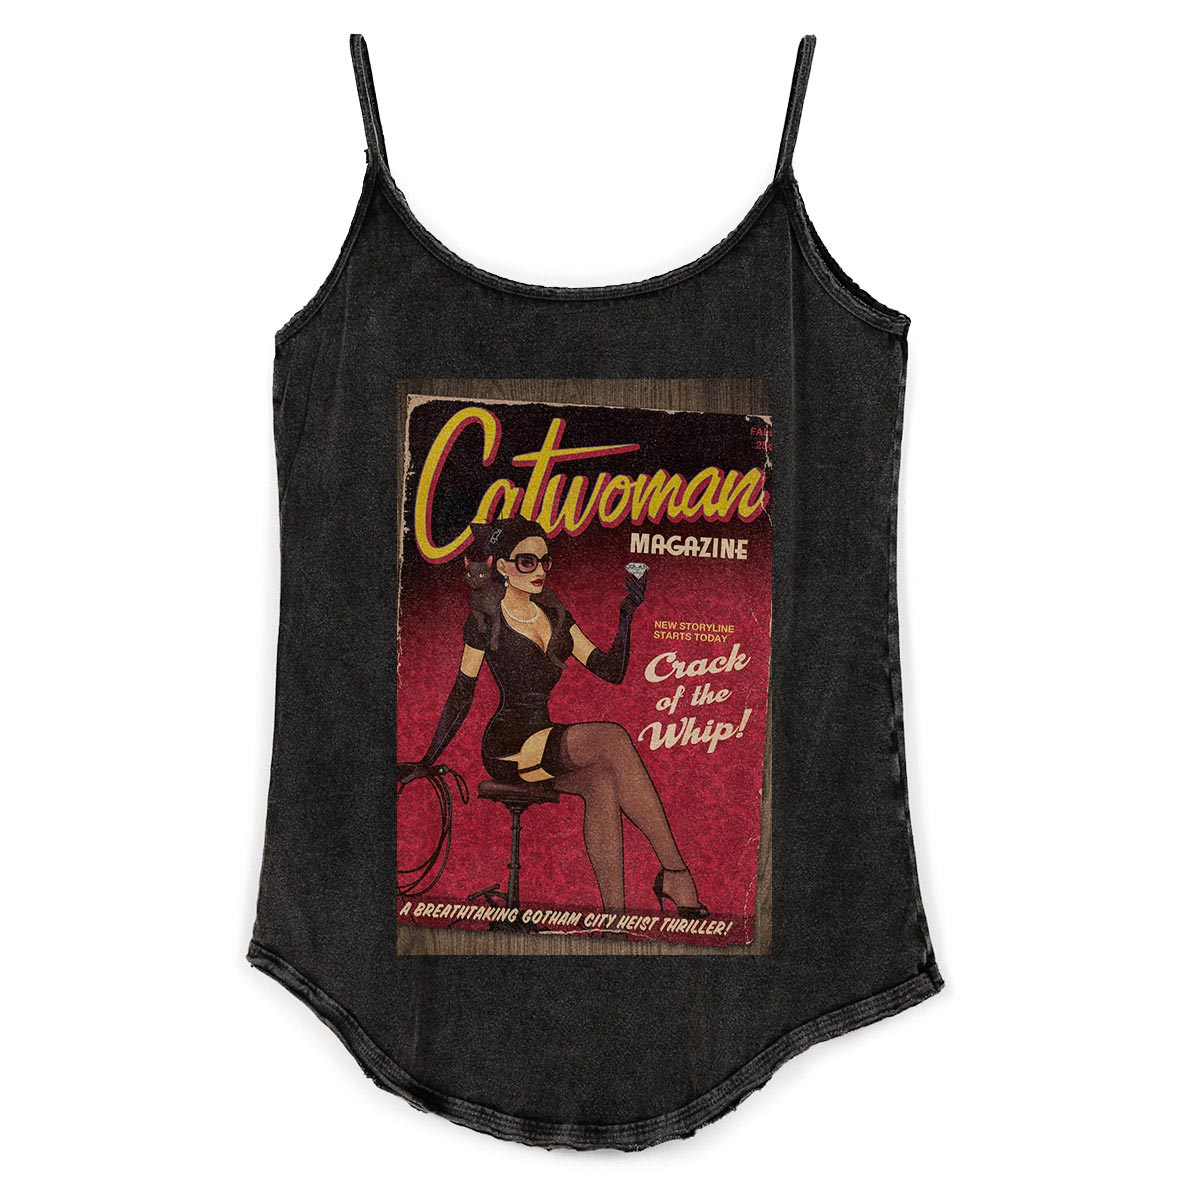 Regatinha Feminina Catwoman Magazine  - bandUP Store Marketplace